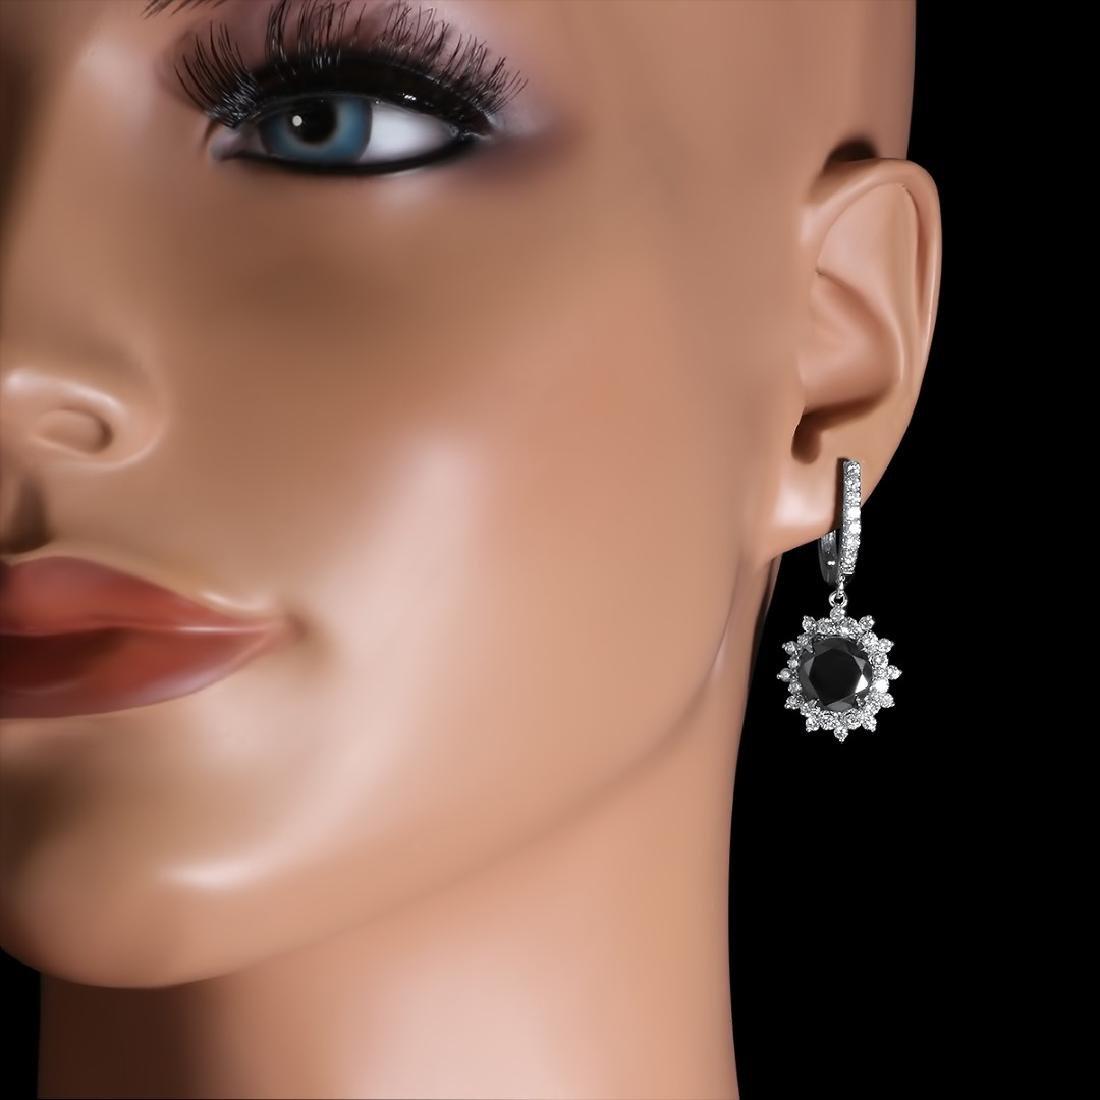 14K White Gold, 9.65cts Diamond Earrings - 3